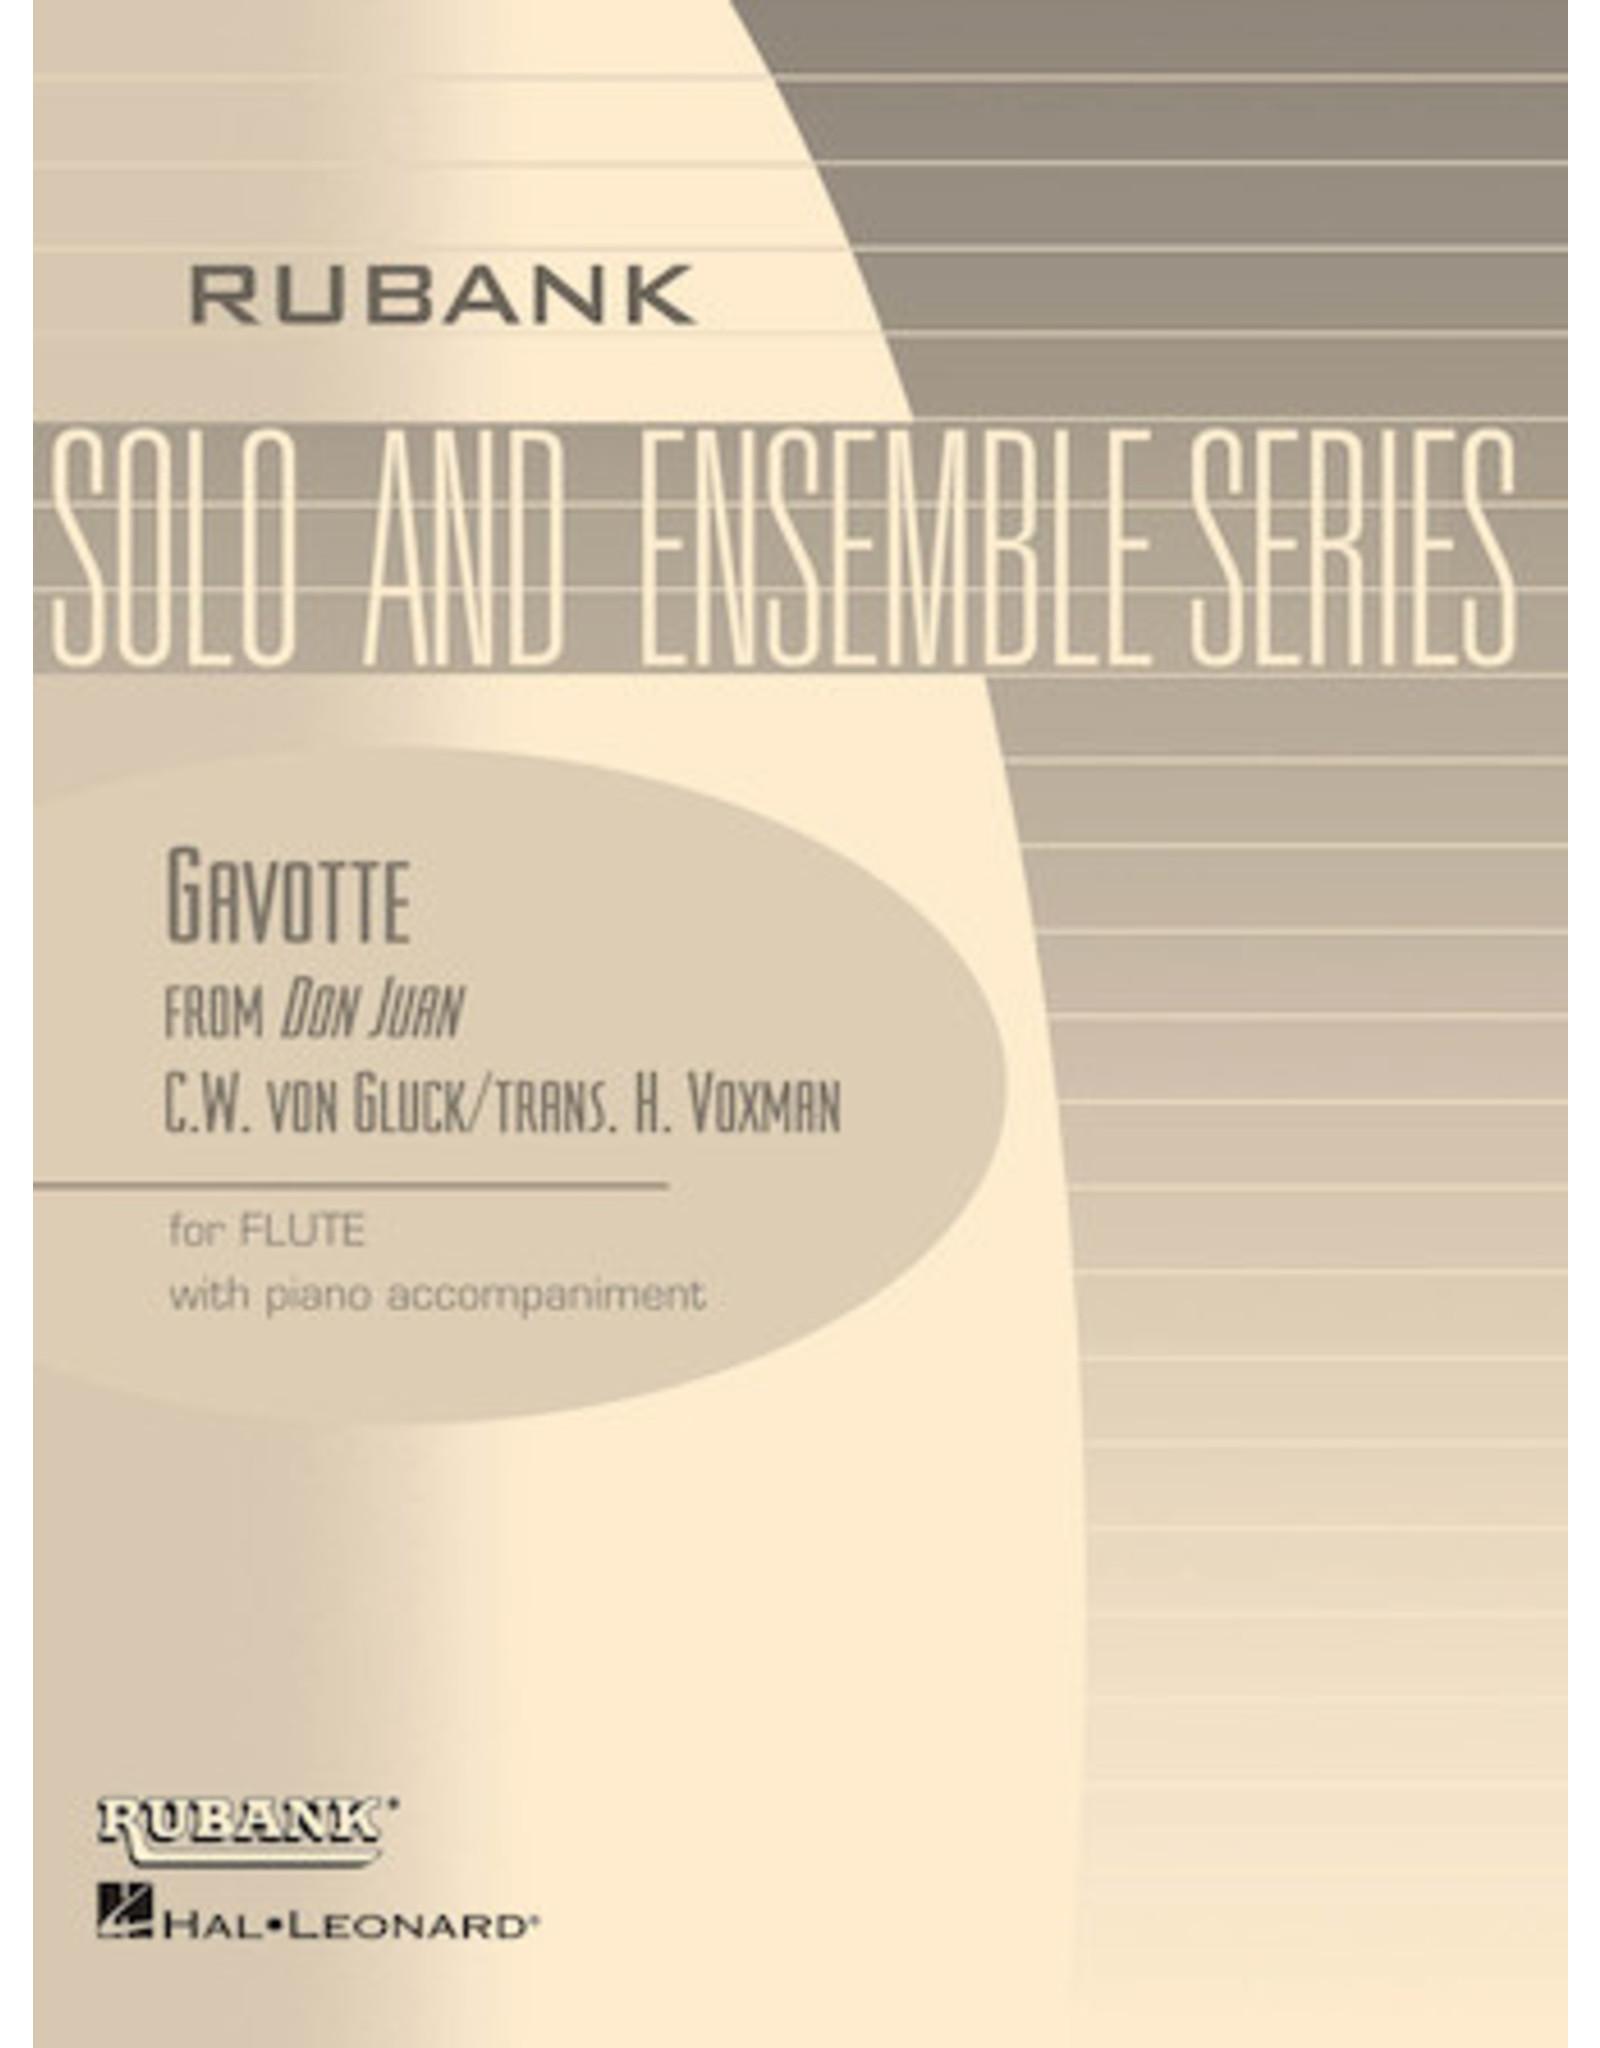 Hal Leonard Von Gluck - Gavotte from Don Juan Flute Solo with Piano